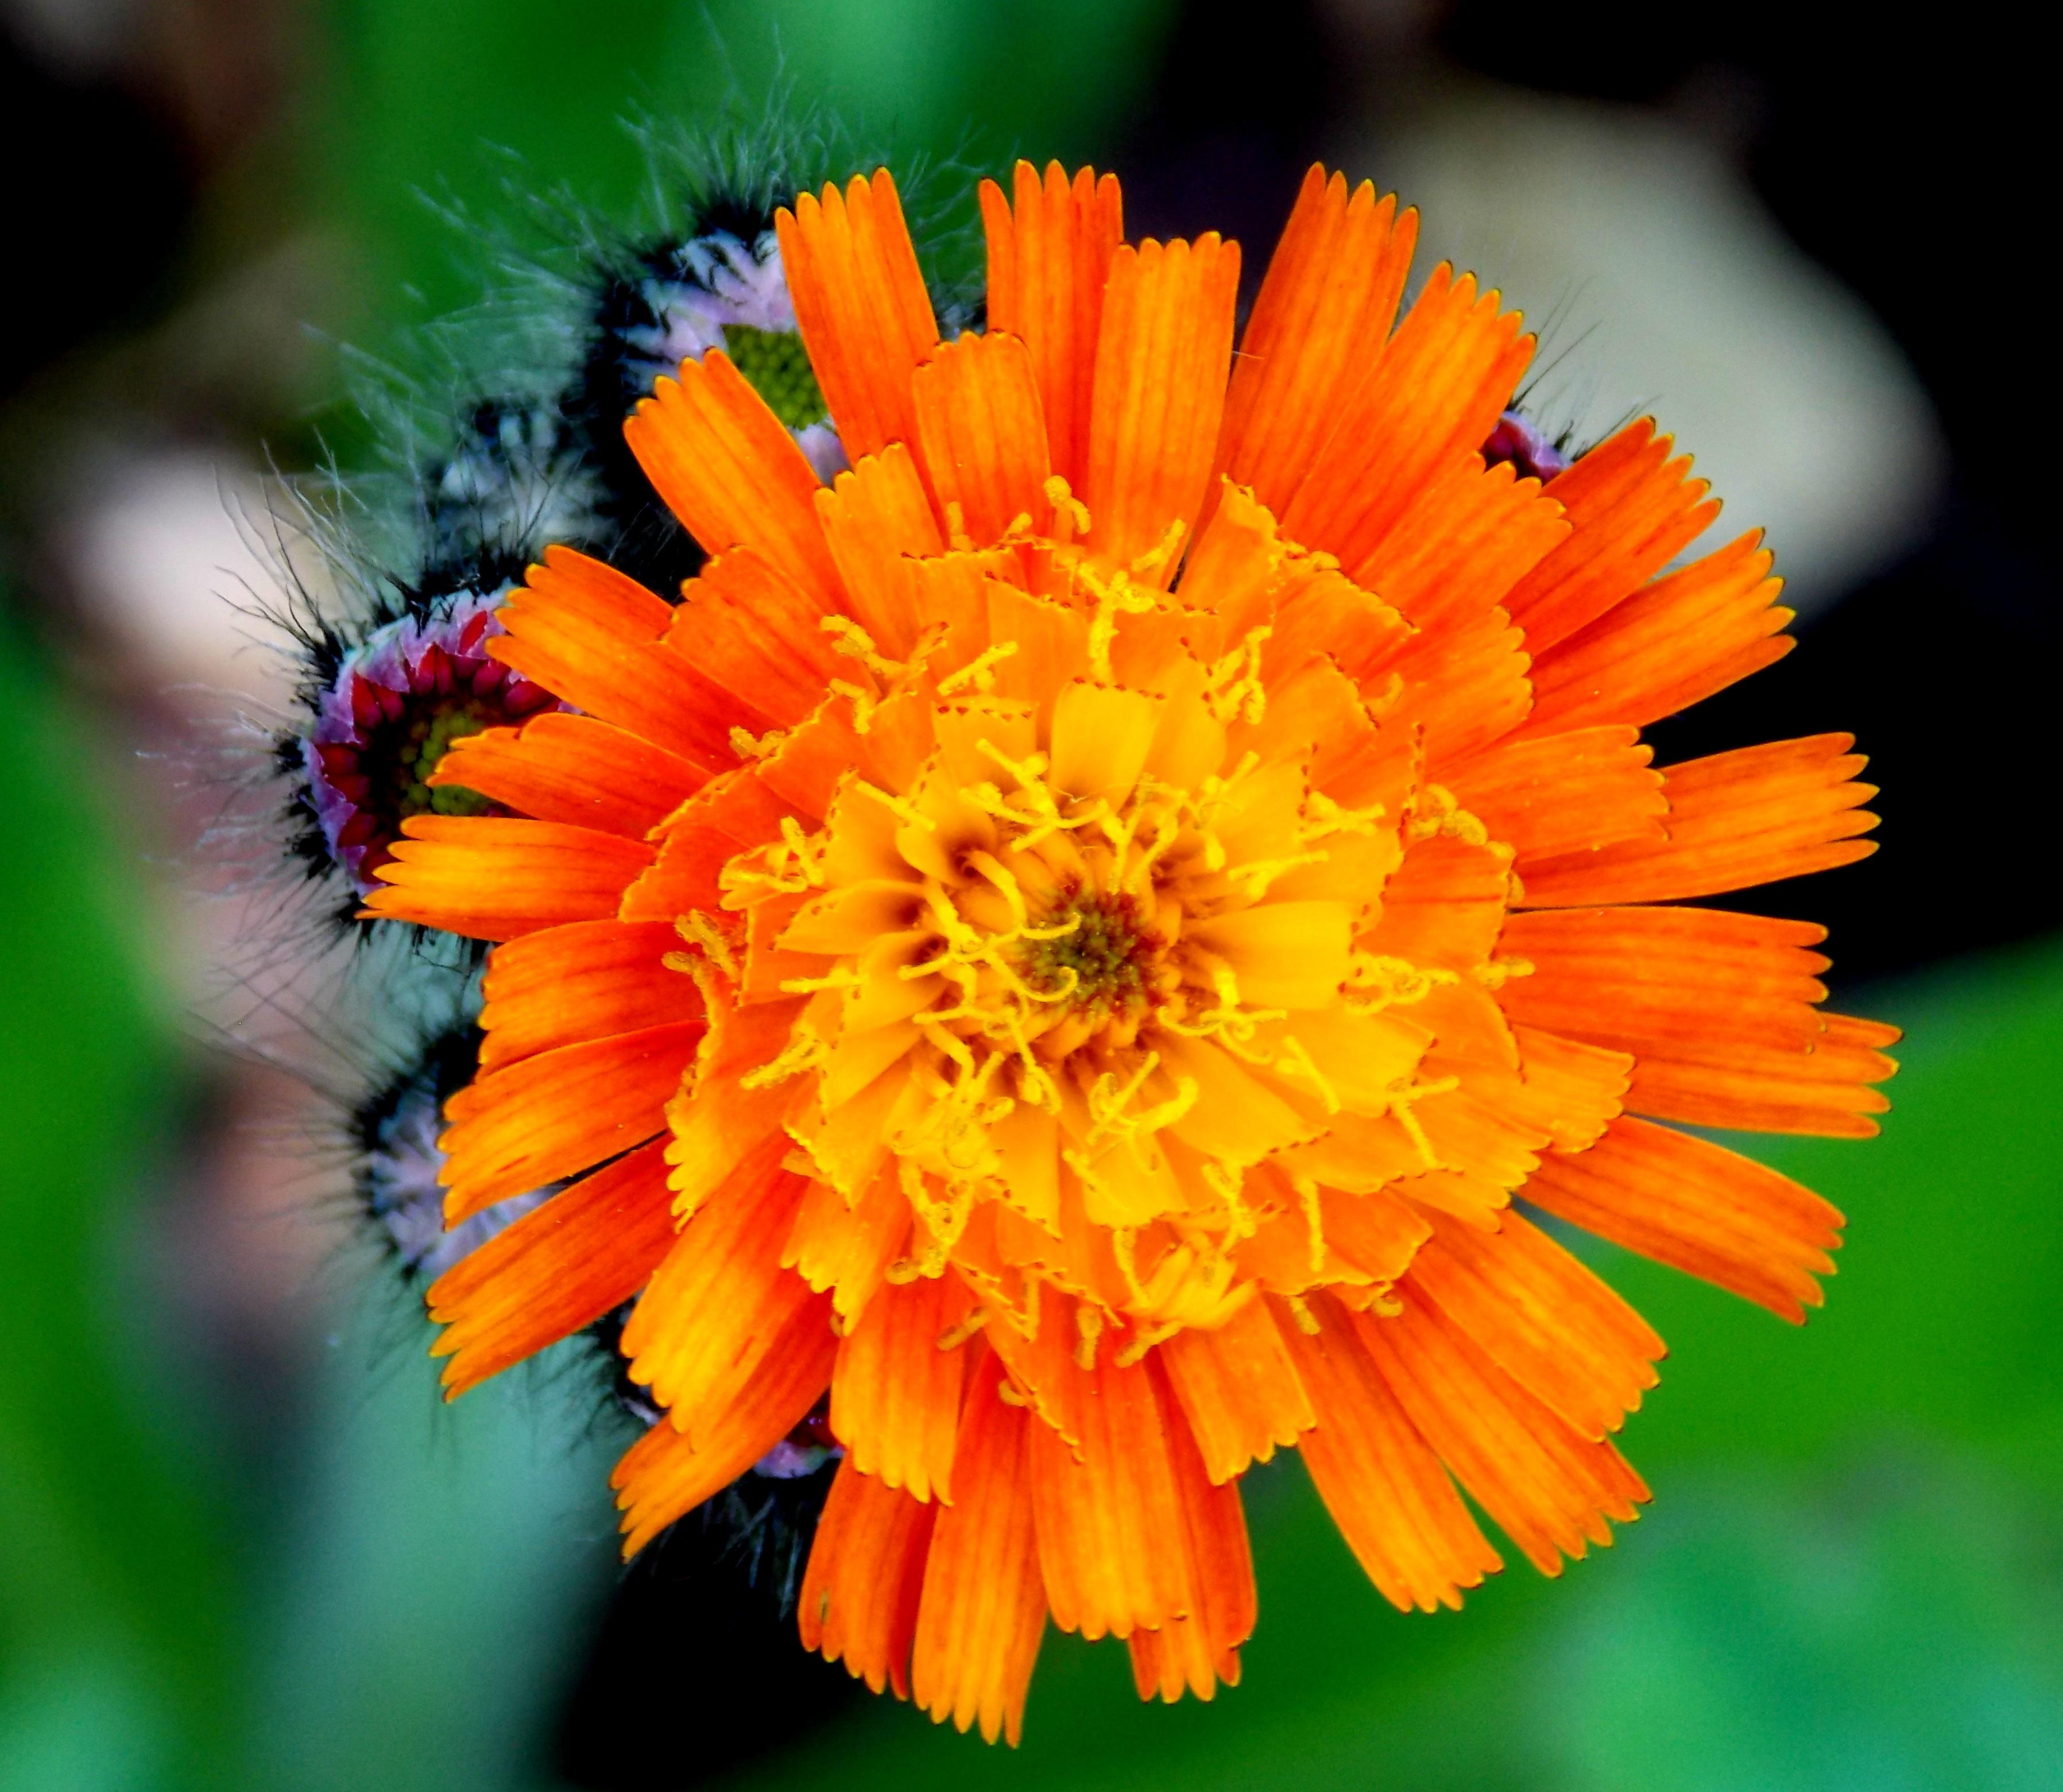 Free Images Nature Blossom Petal Bloom Summer Spring Herb